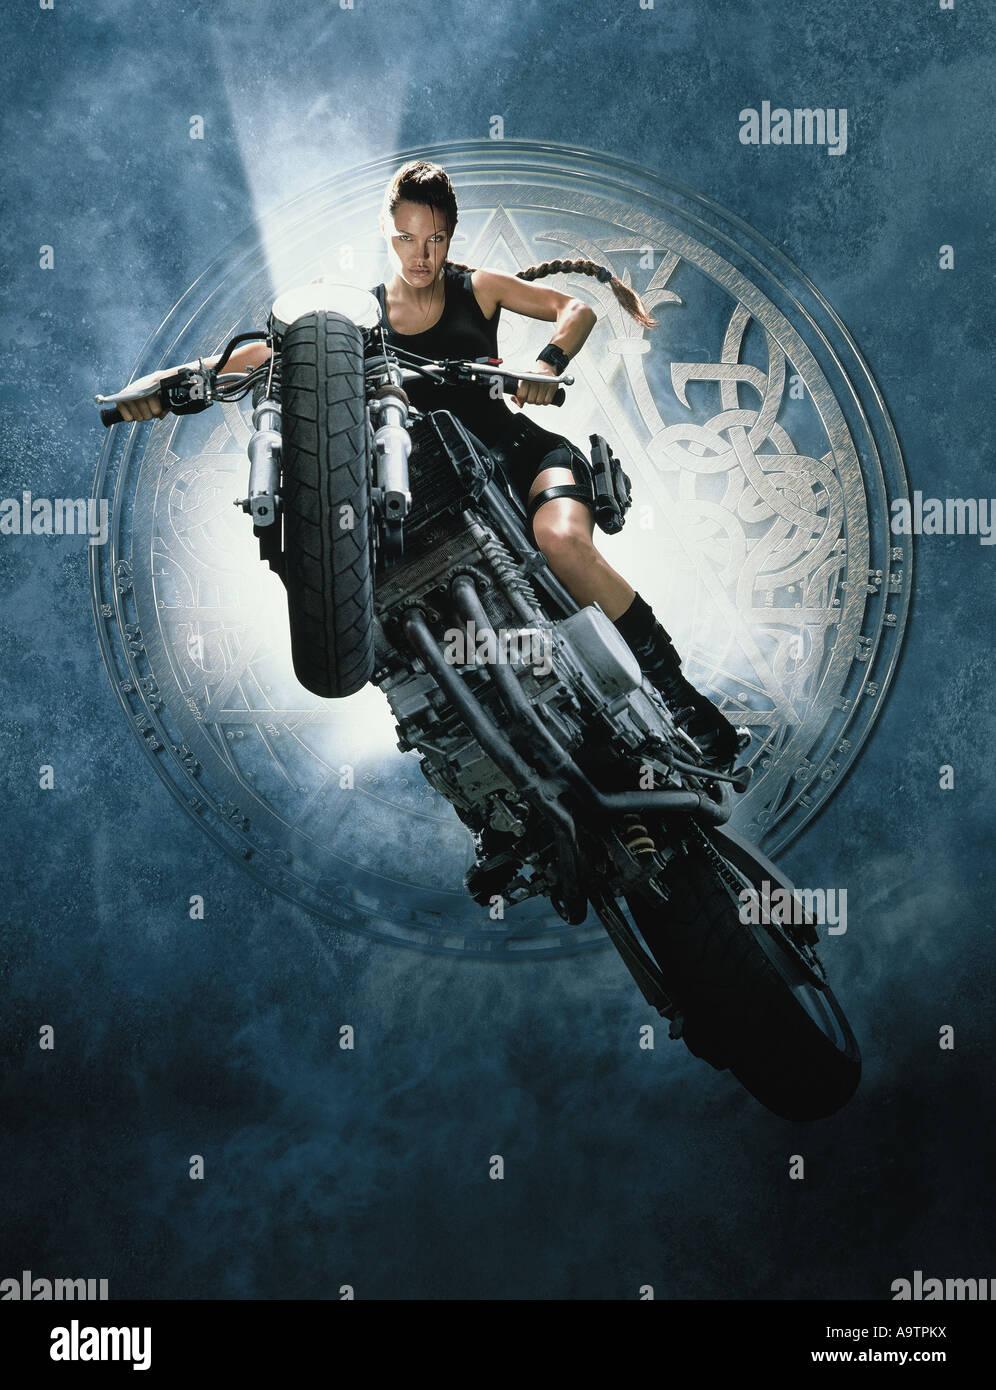 LARA CROFT : TOMB RAIDER - 2001 Paramount film with Angelina Jolie as Lara Croft - Stock Image